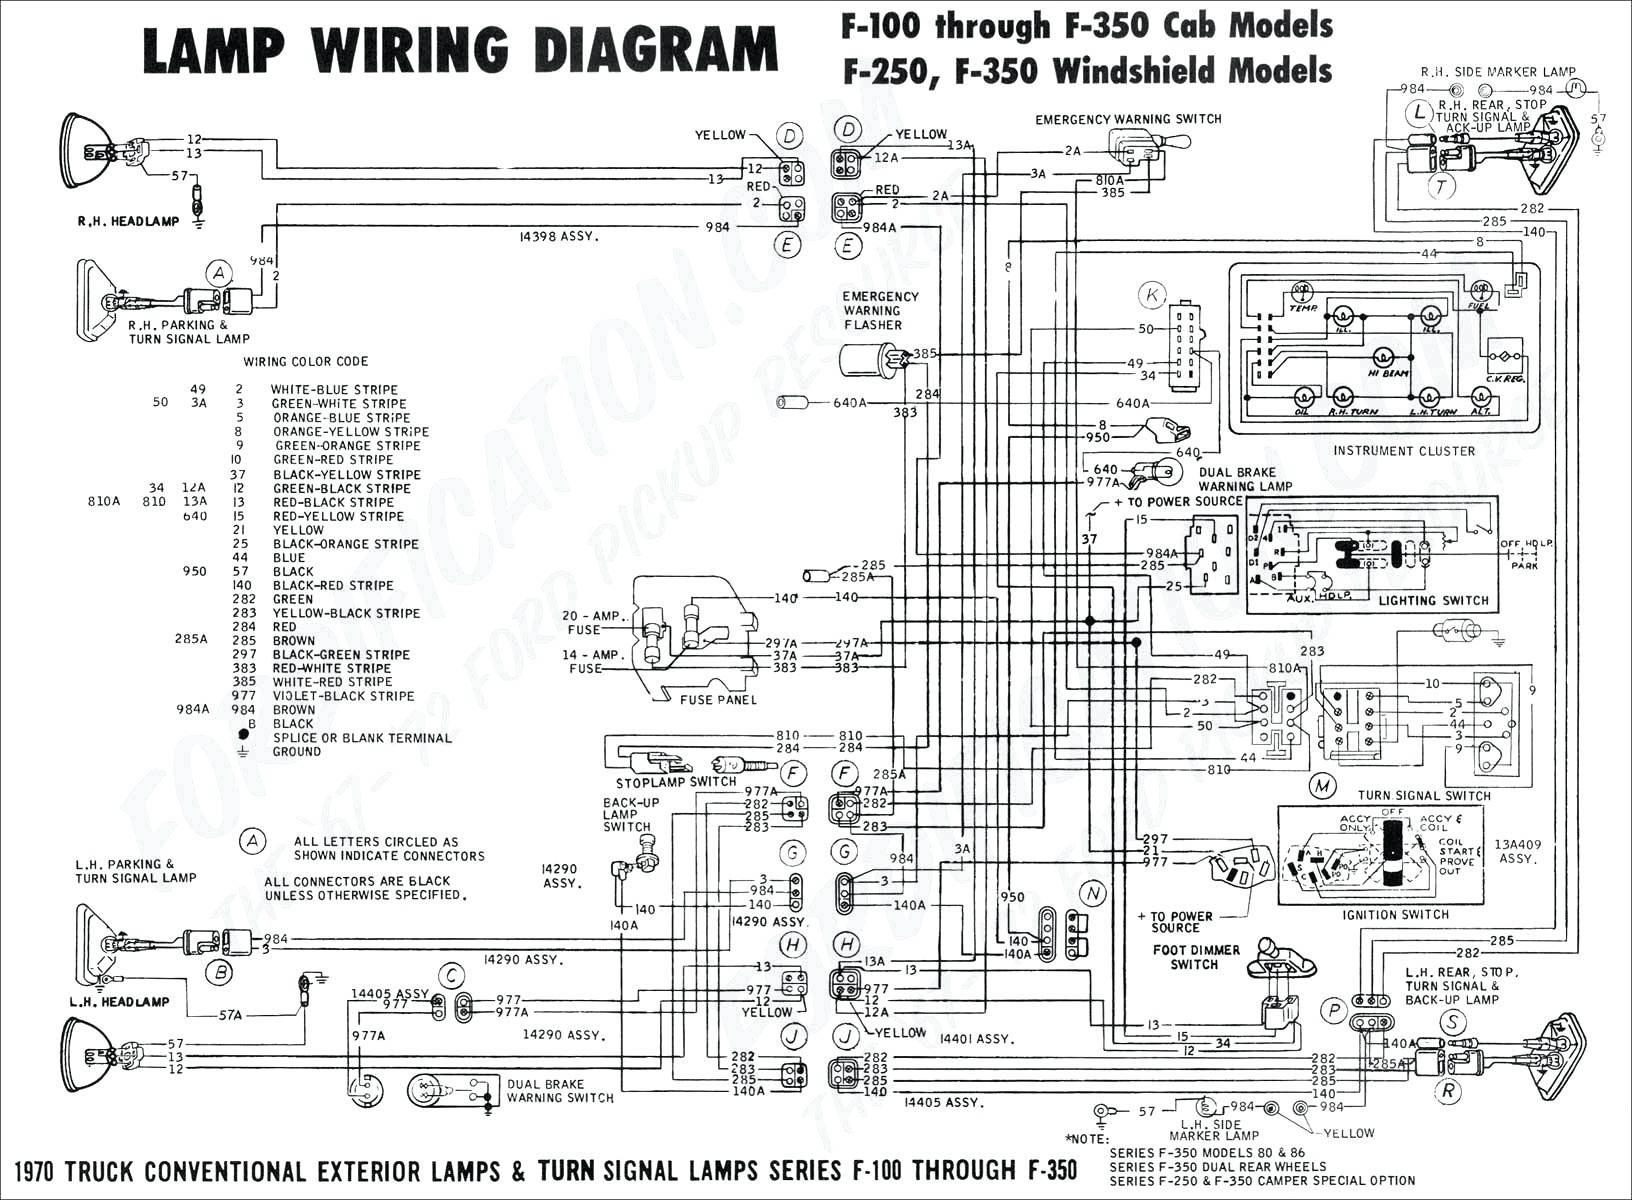 Semi Trailer Wiring Diagram Unique Wiring Diagram ford F150 Trailer Lights Truck Best ford Engine